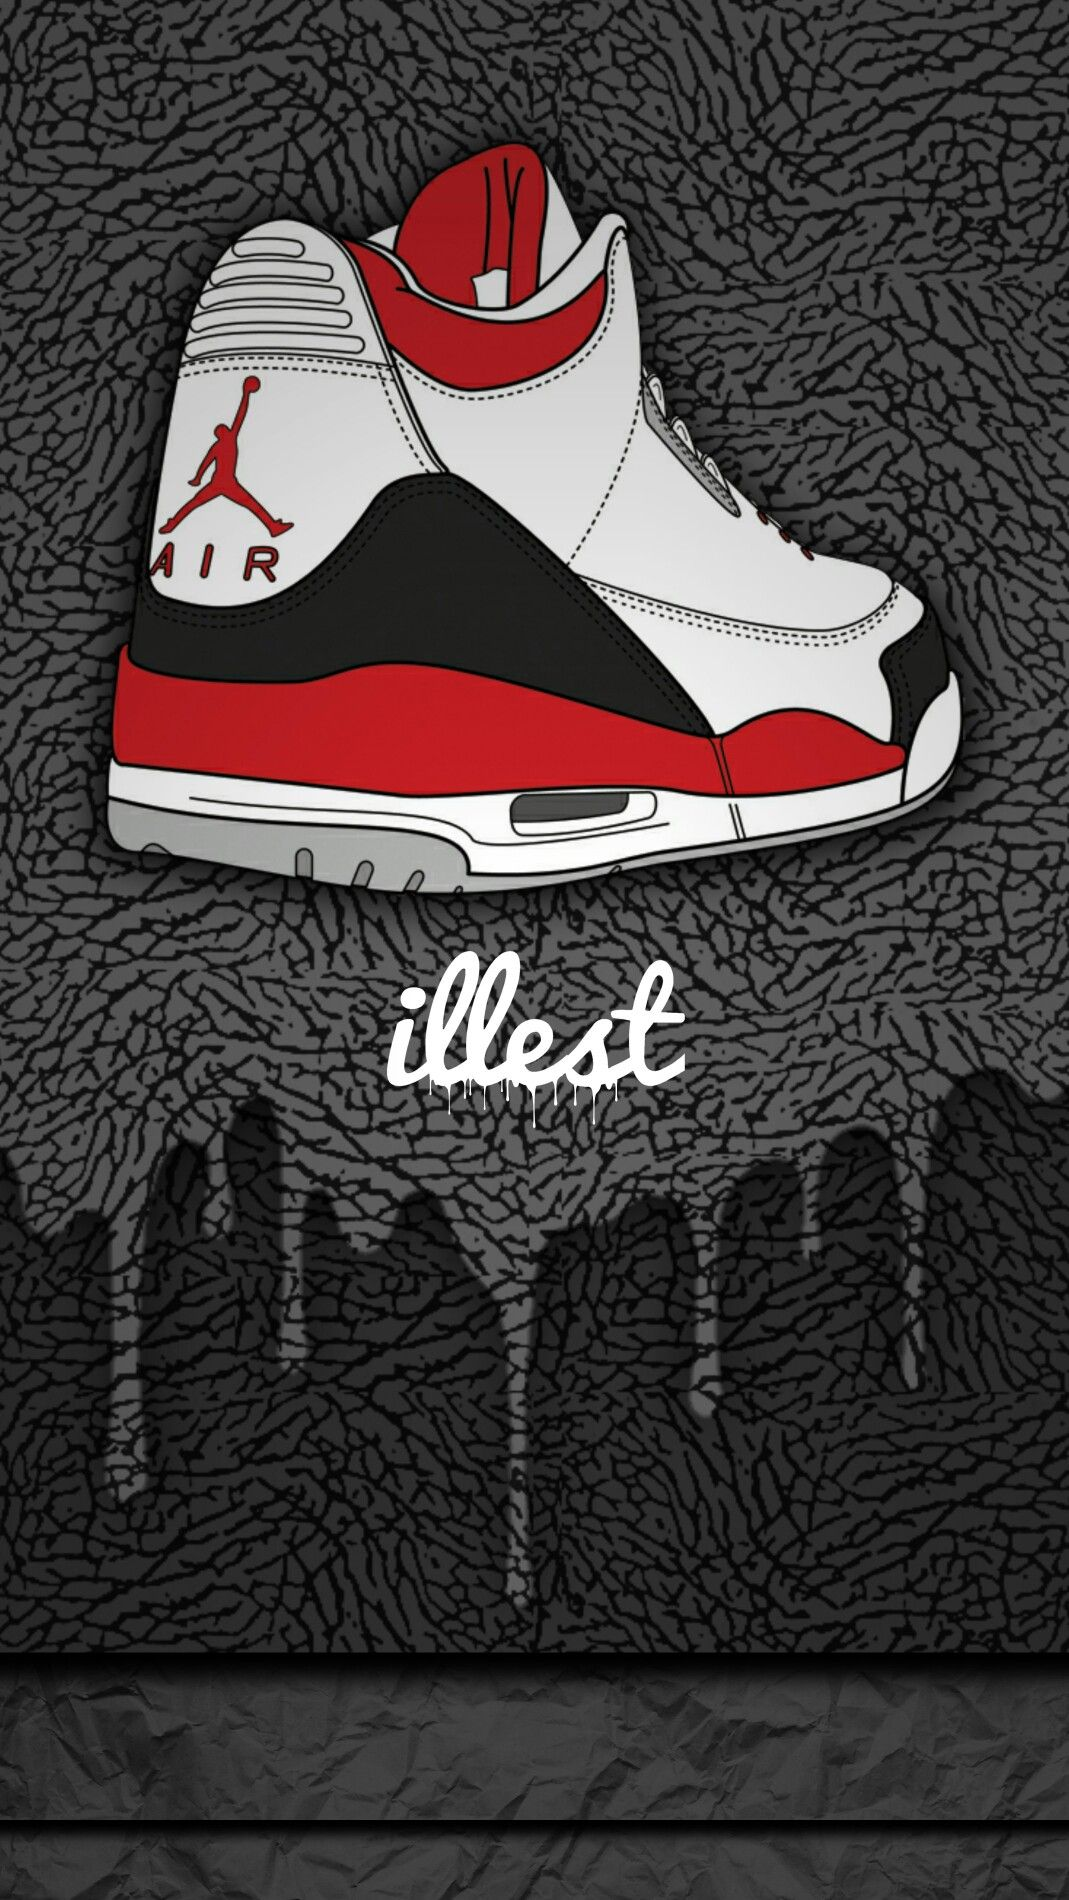 cheaper 78eb2 ada4d Tinker Hatfield · Sneakers Box · Supreme Logo · Jordan Shoes Wallpaper,  Sneakers Wallpaper, Cute Wallpaper Backgrounds, Nike Wallpaper, Retro  Wallpaper